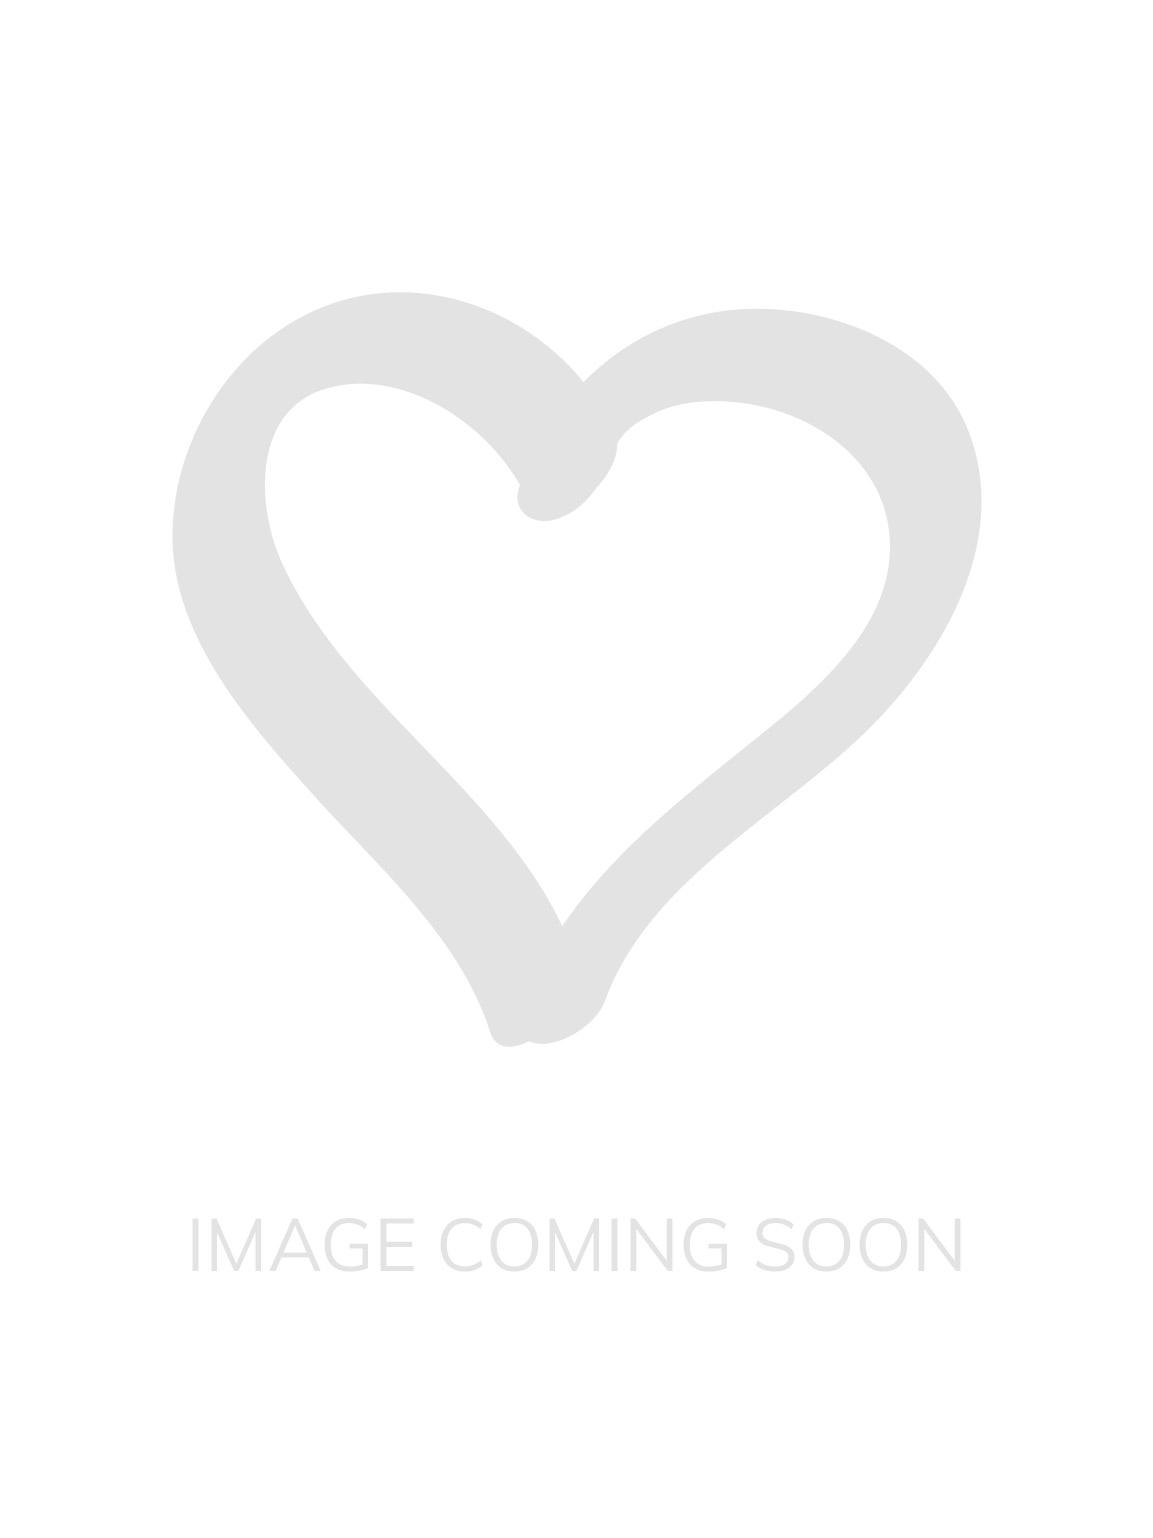 951d09aca1 Soft Short Bath Robe Dressing Gown - Black